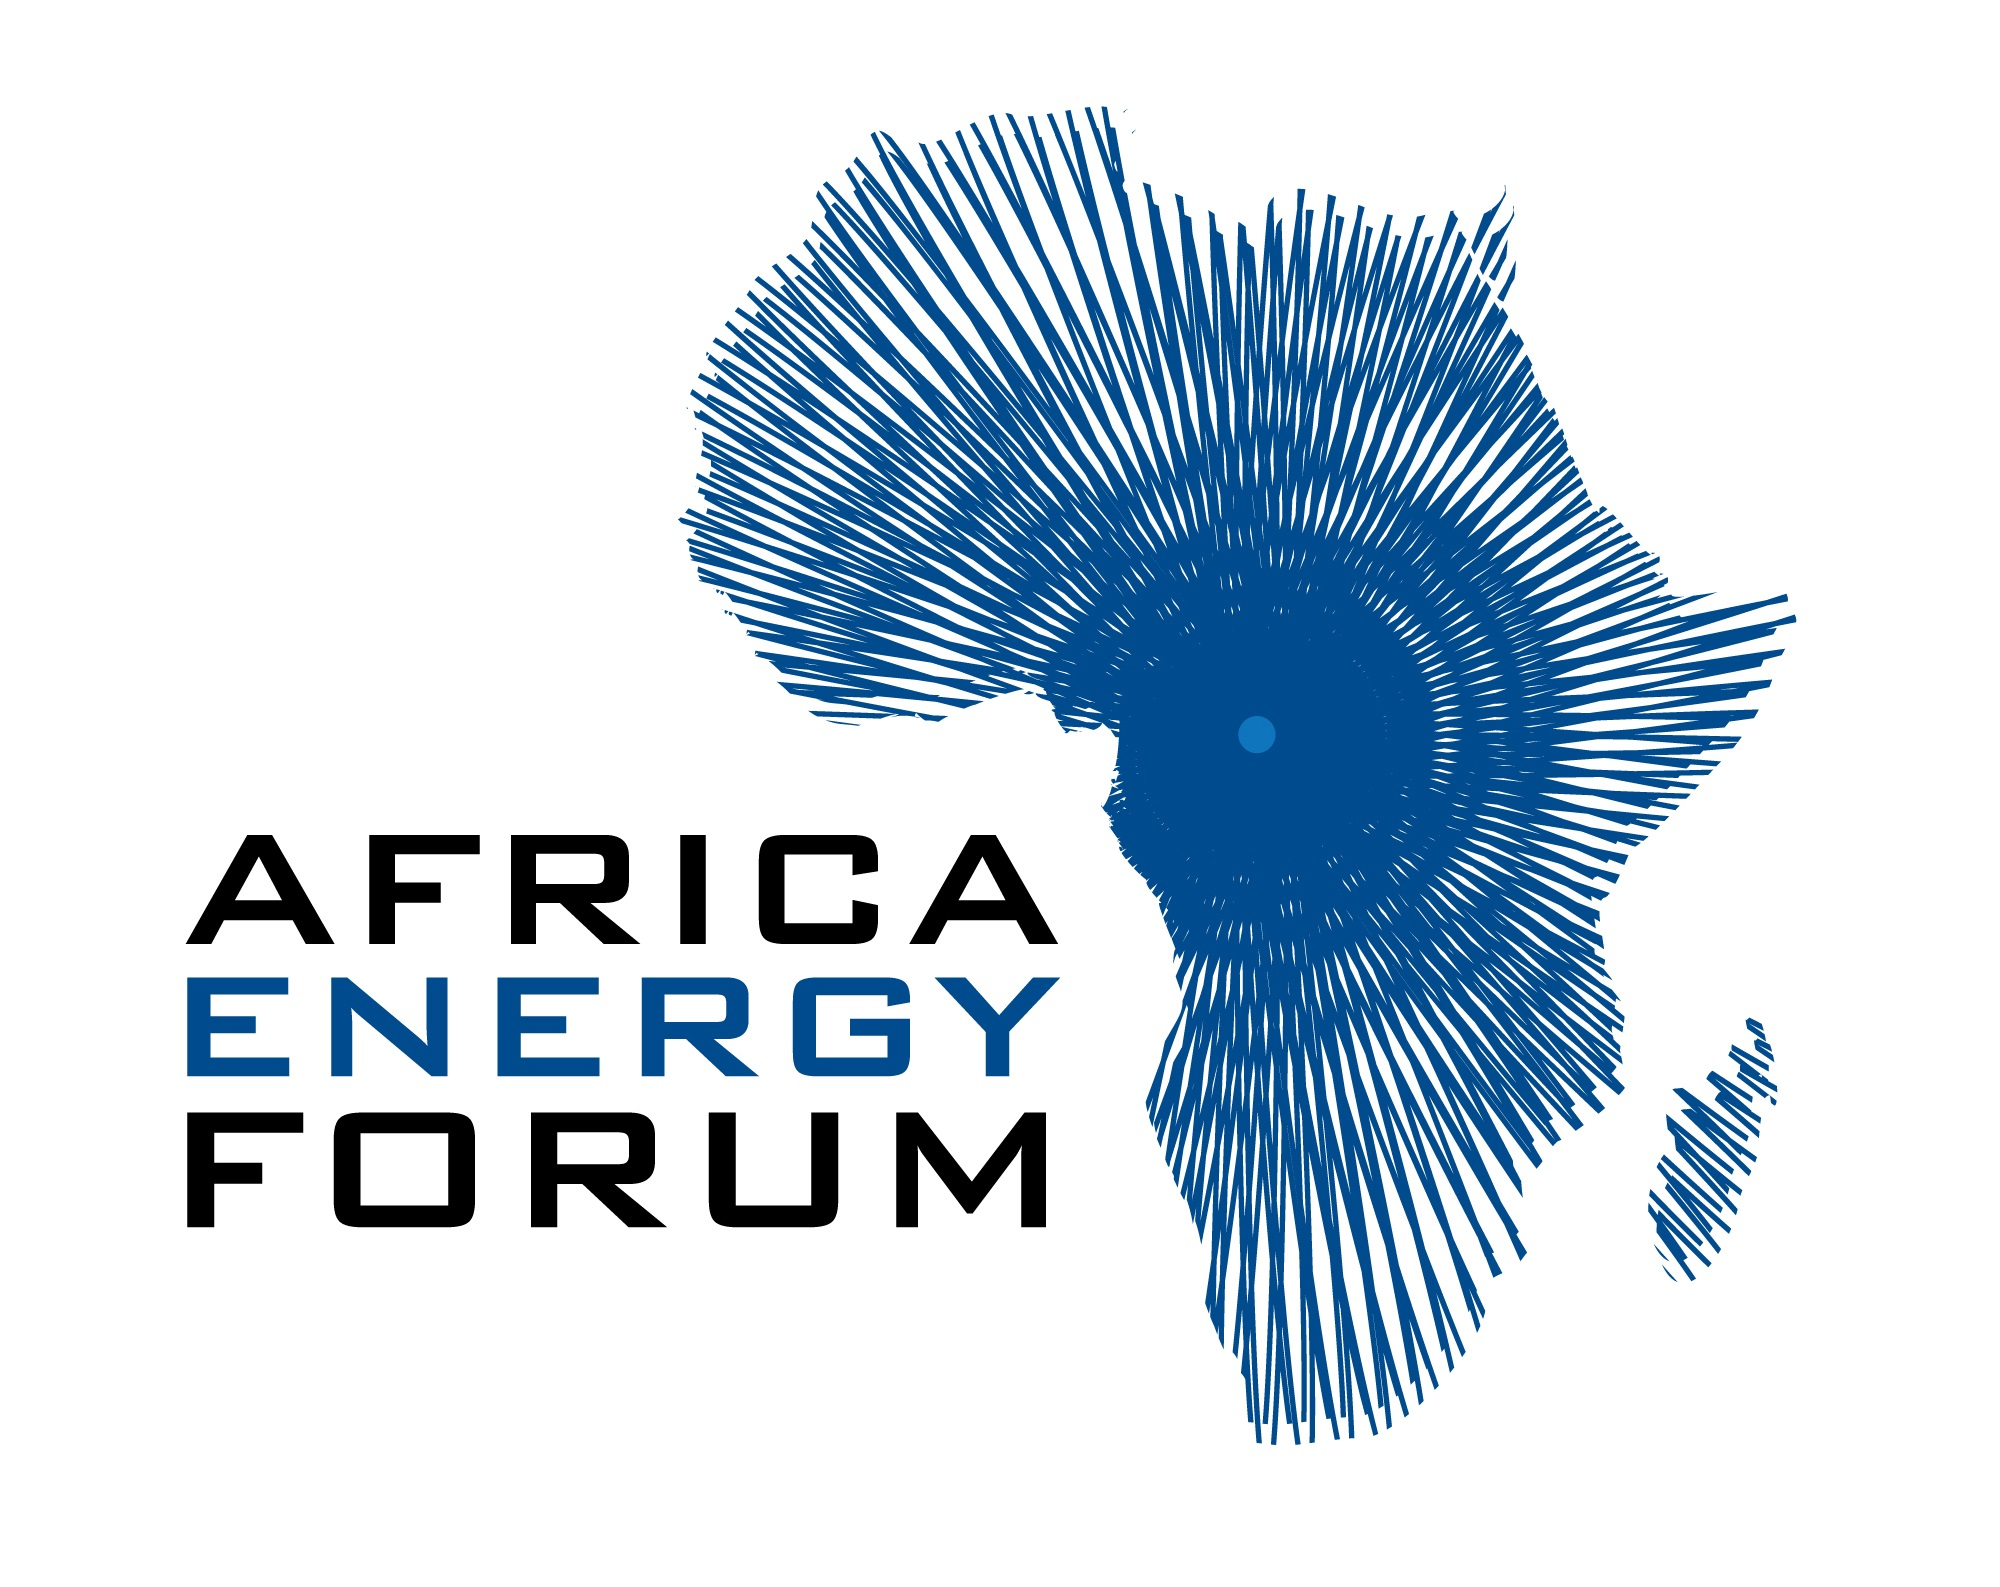 Africa energy